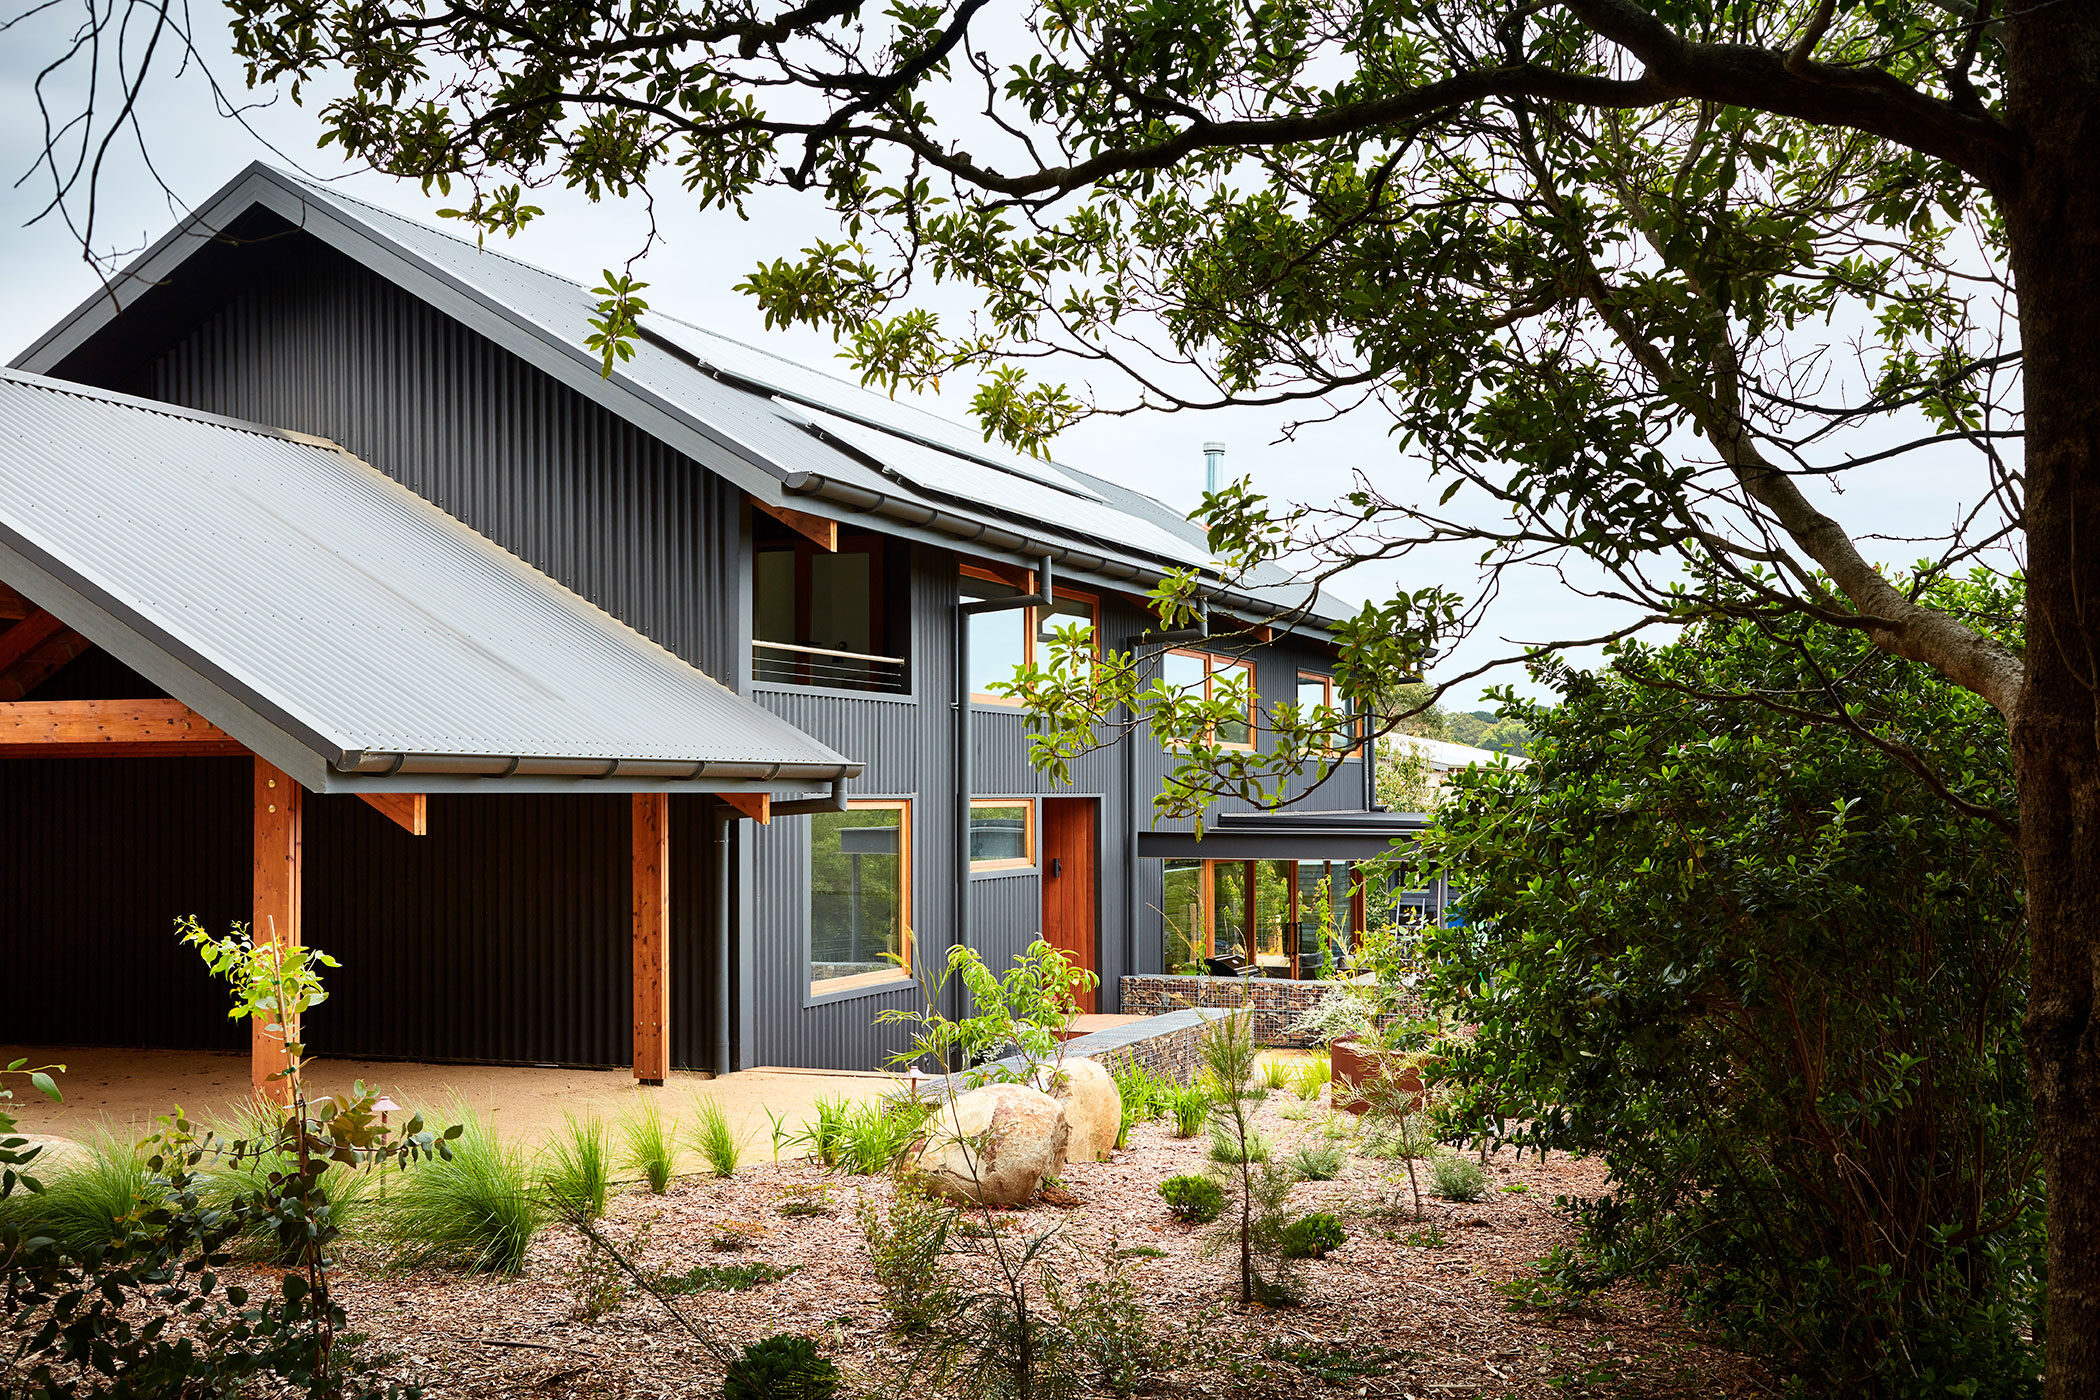 Main Ridge Barn barn like house viewed through trees - building photographer example / concept